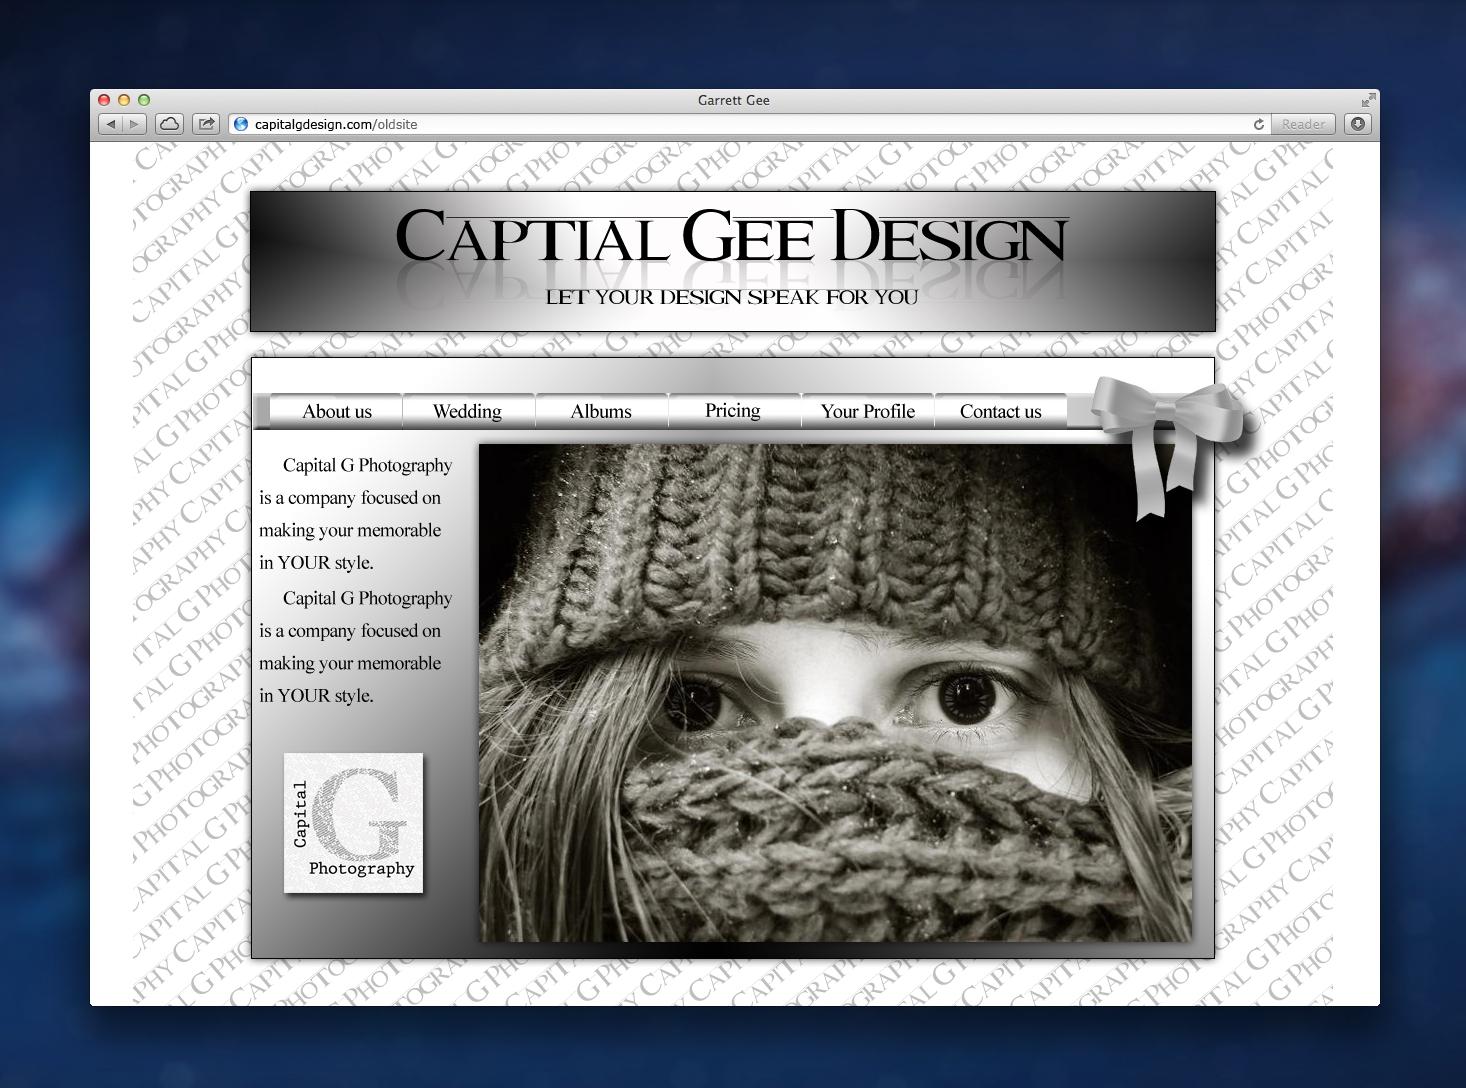 Garrett Gee Website